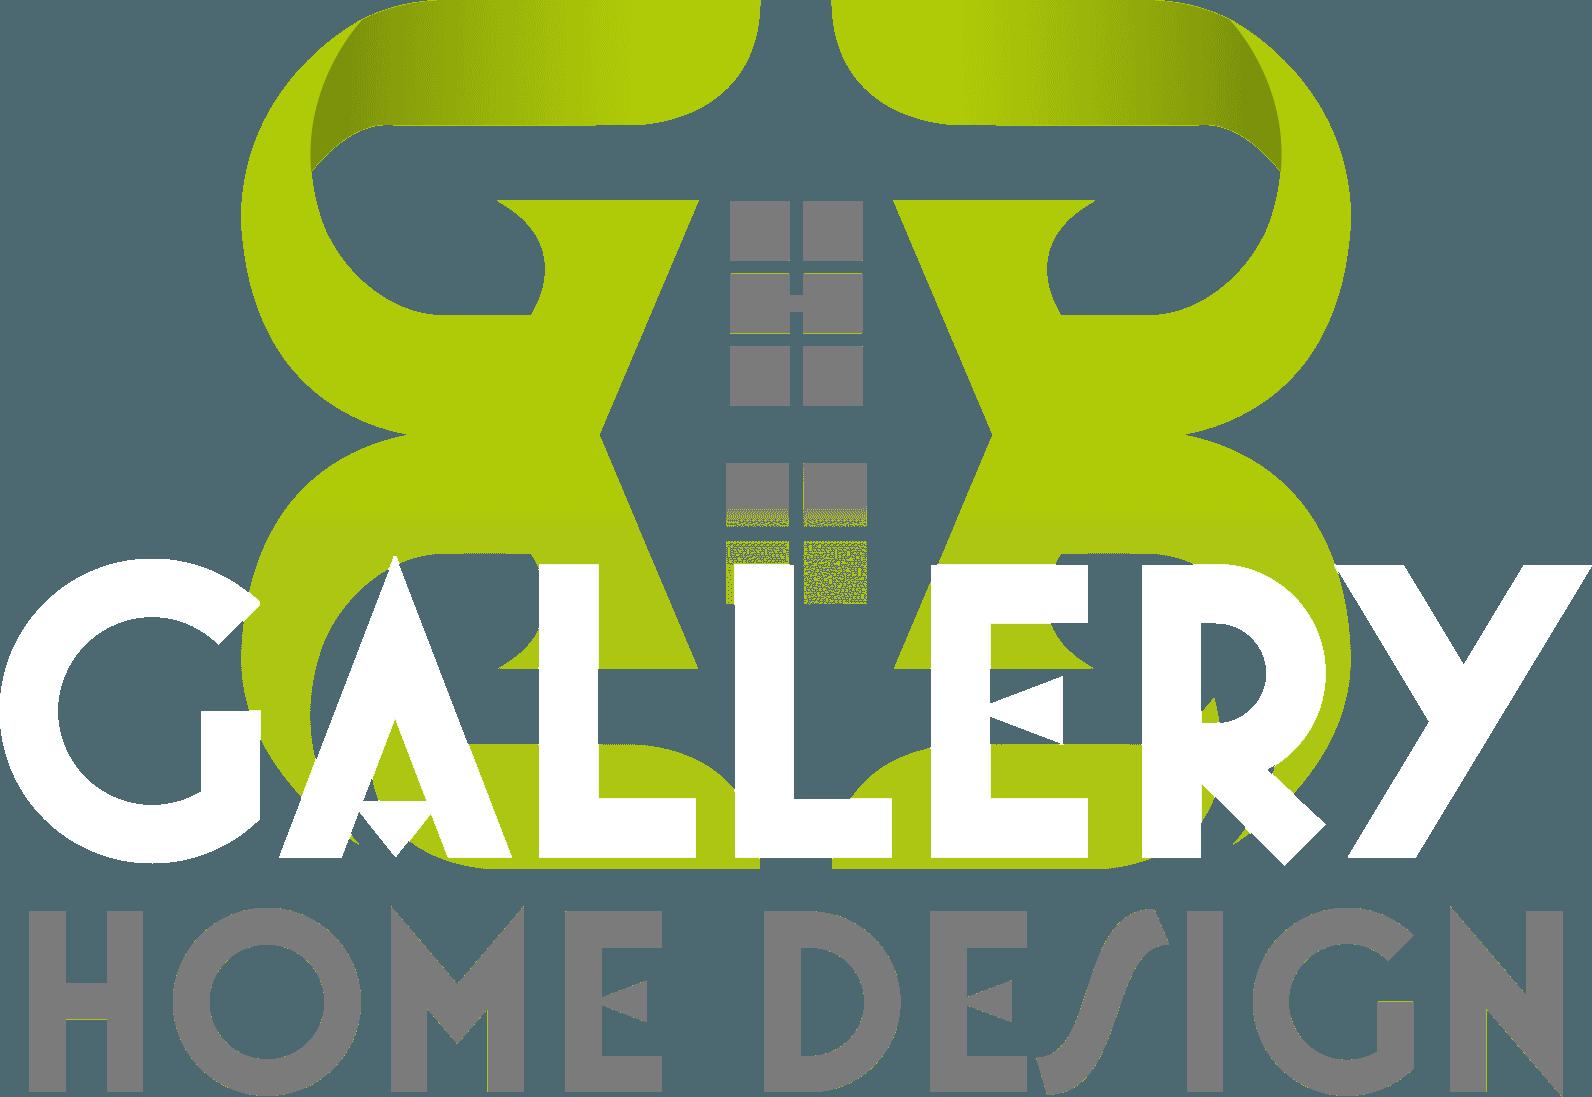 gallery home design footer logo